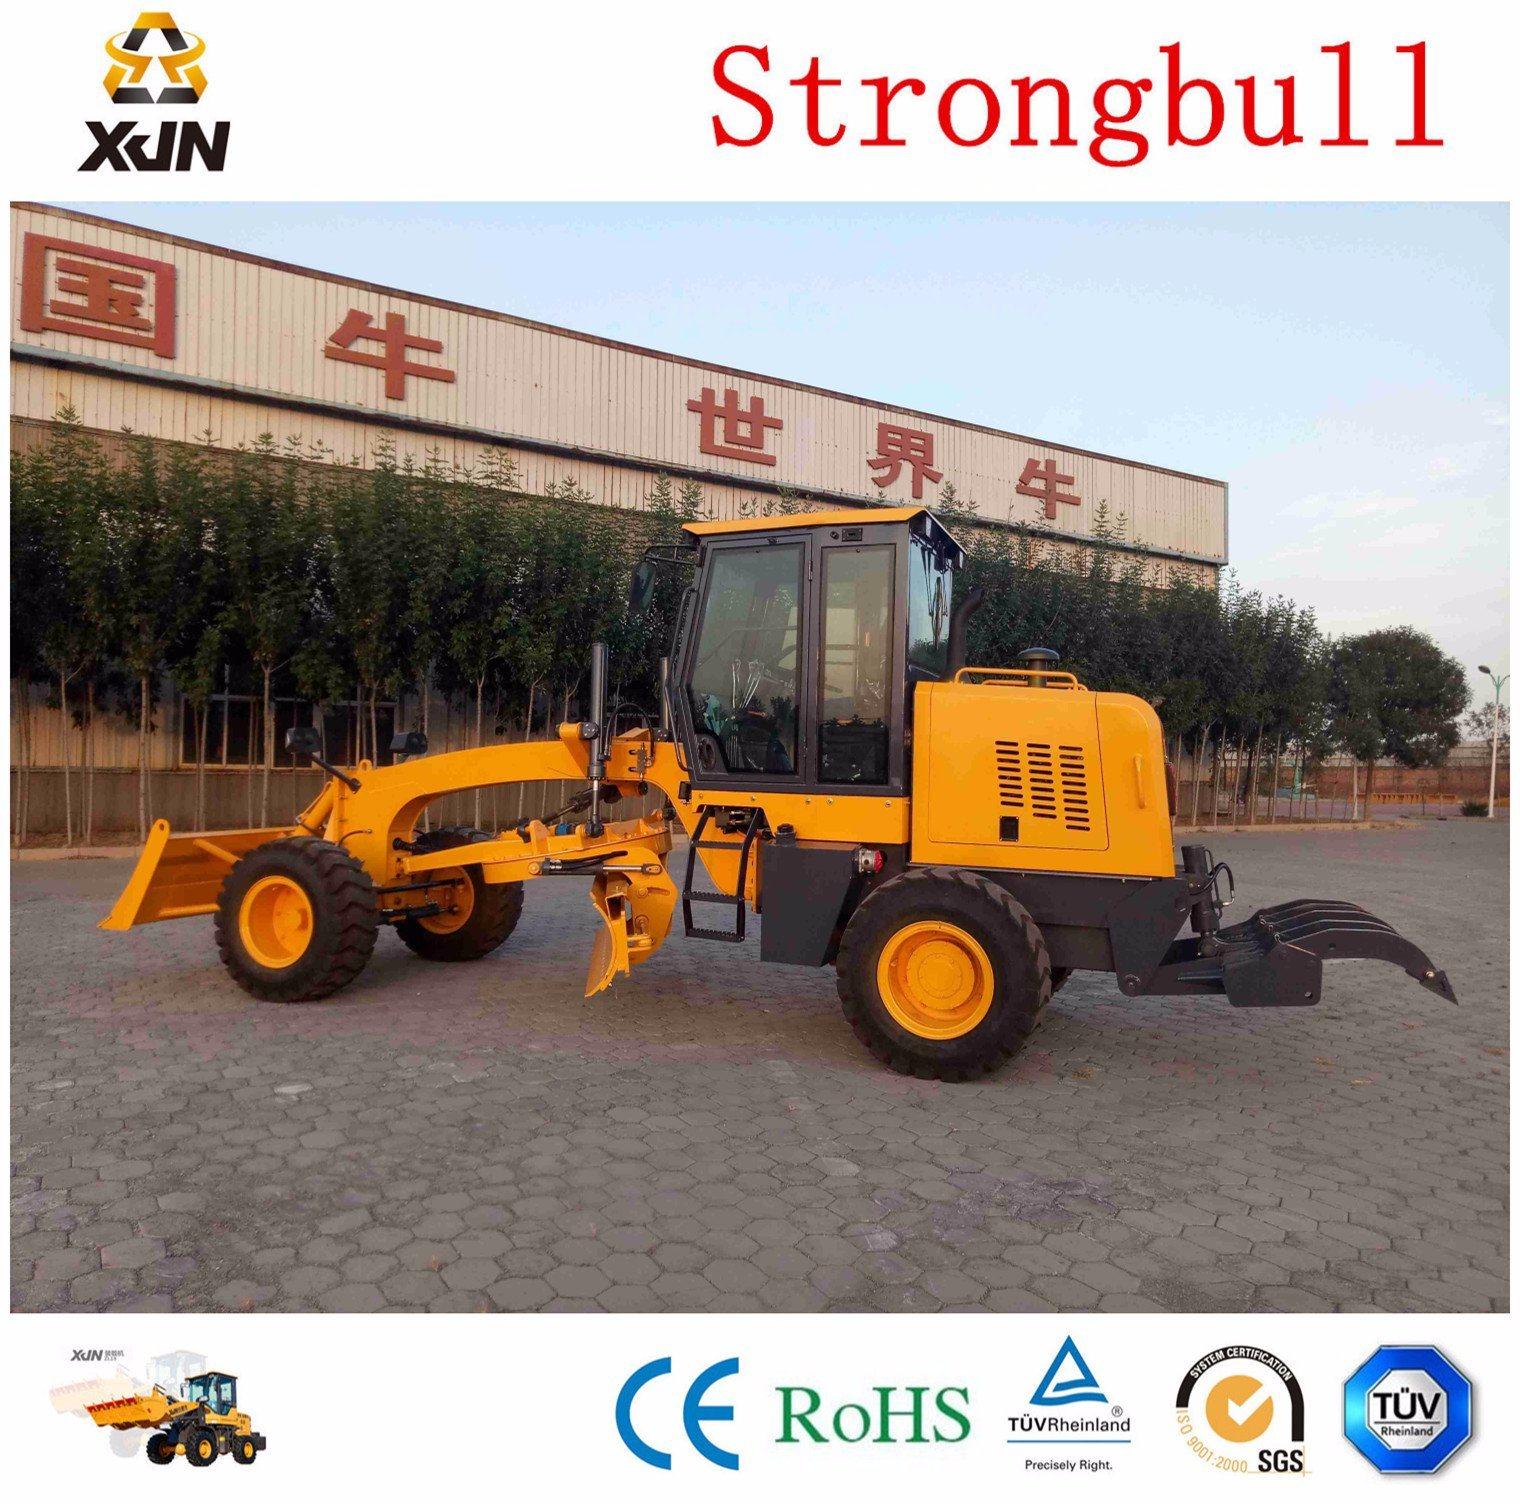 China Strongbull Py9120 Road Construction Equipment Small